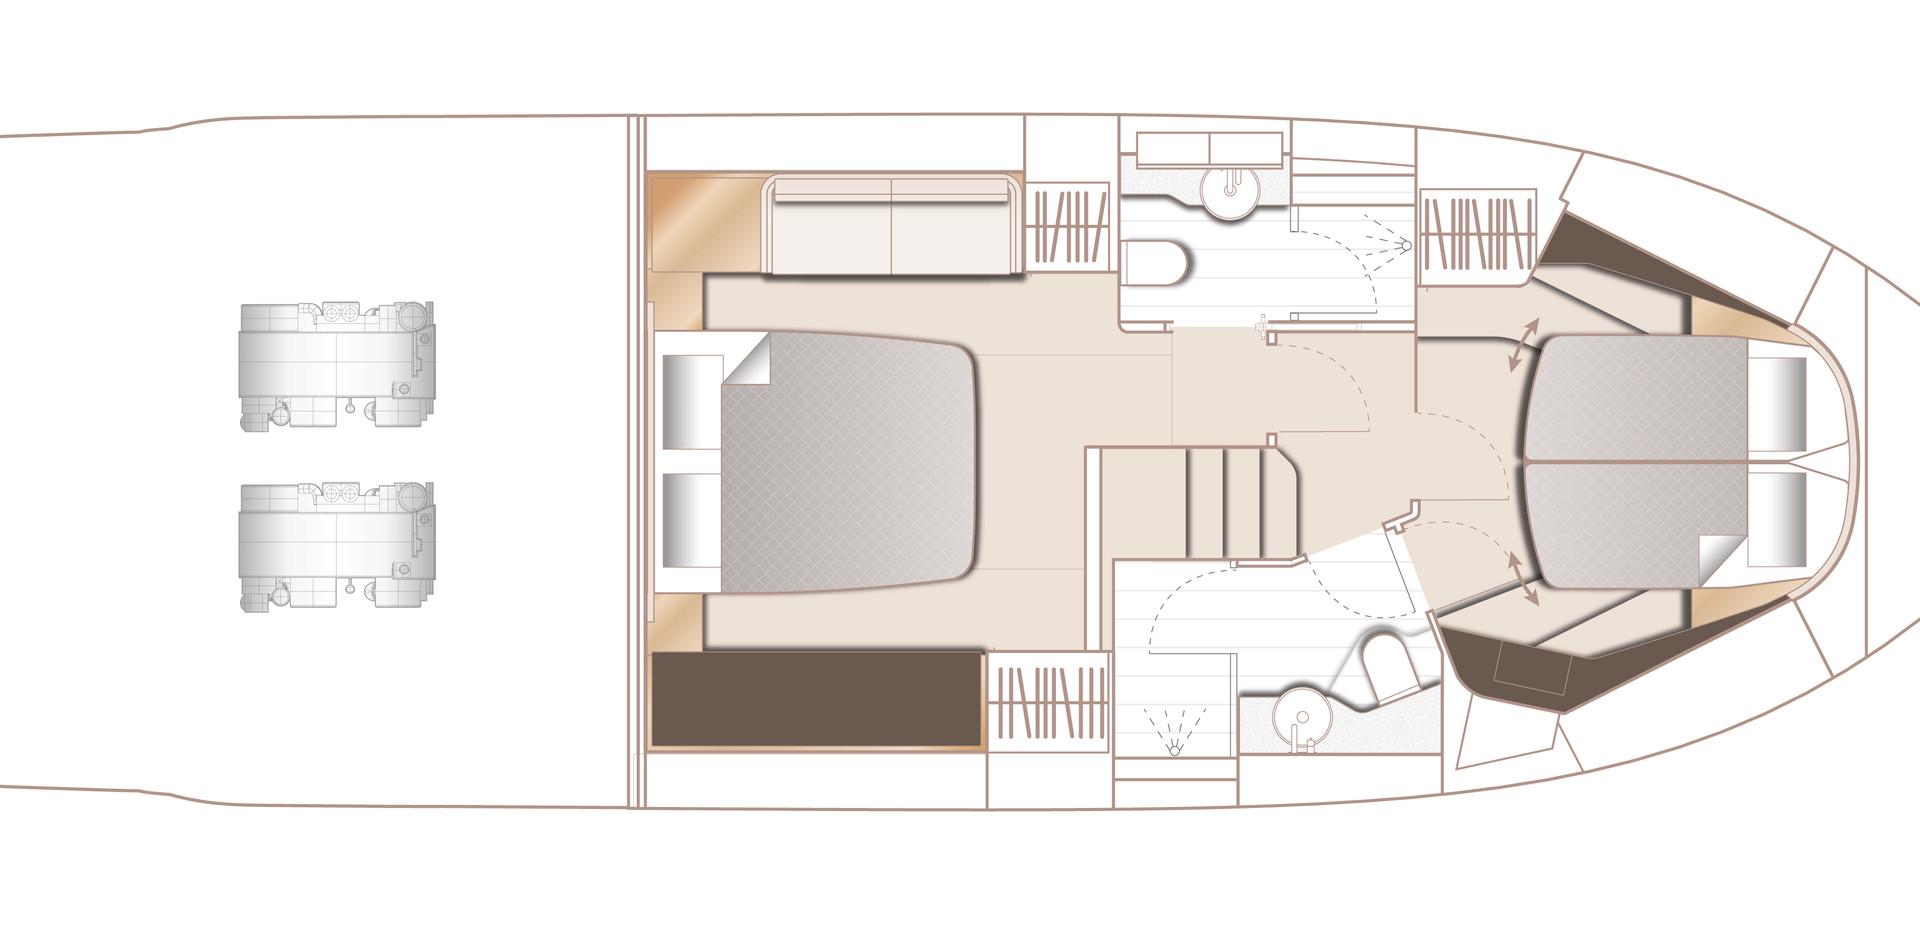 f45-layout-lower-deck.jpg